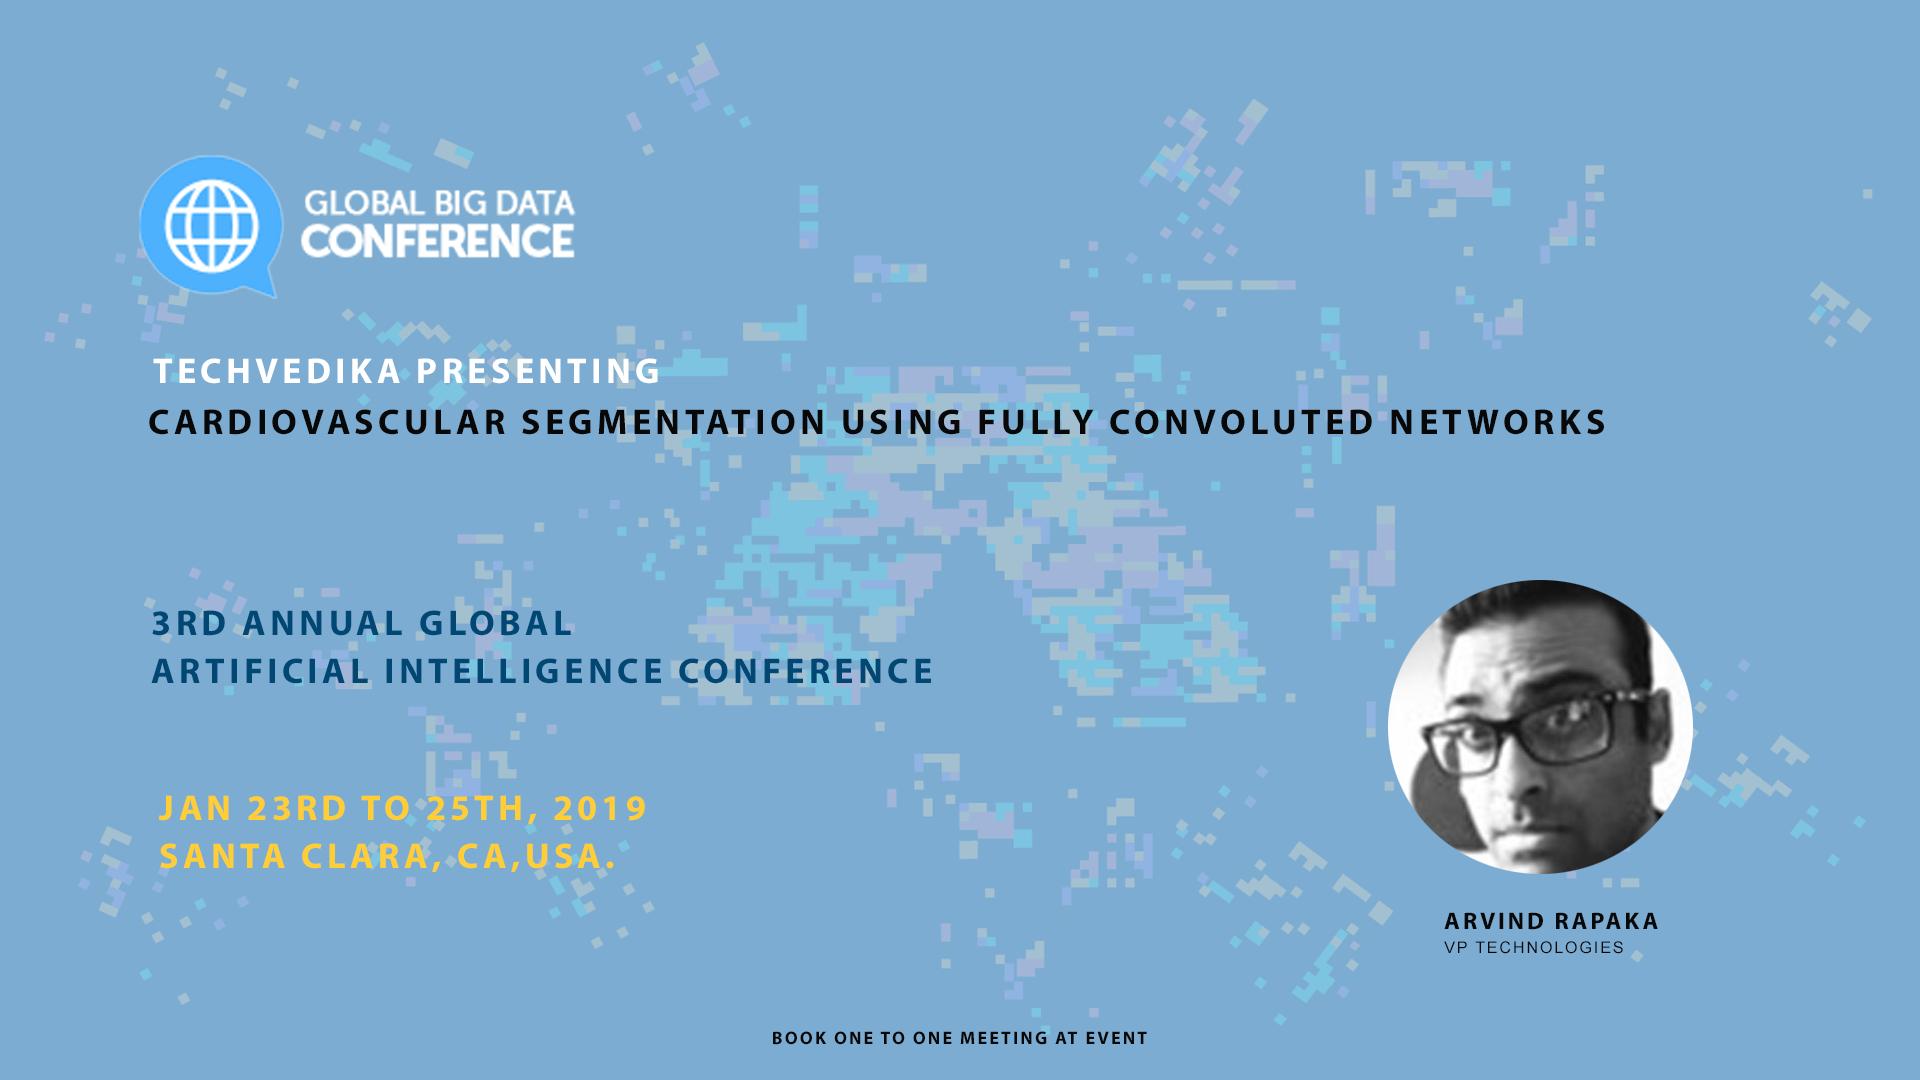 Tech Vedika At The Global Big Data Conference